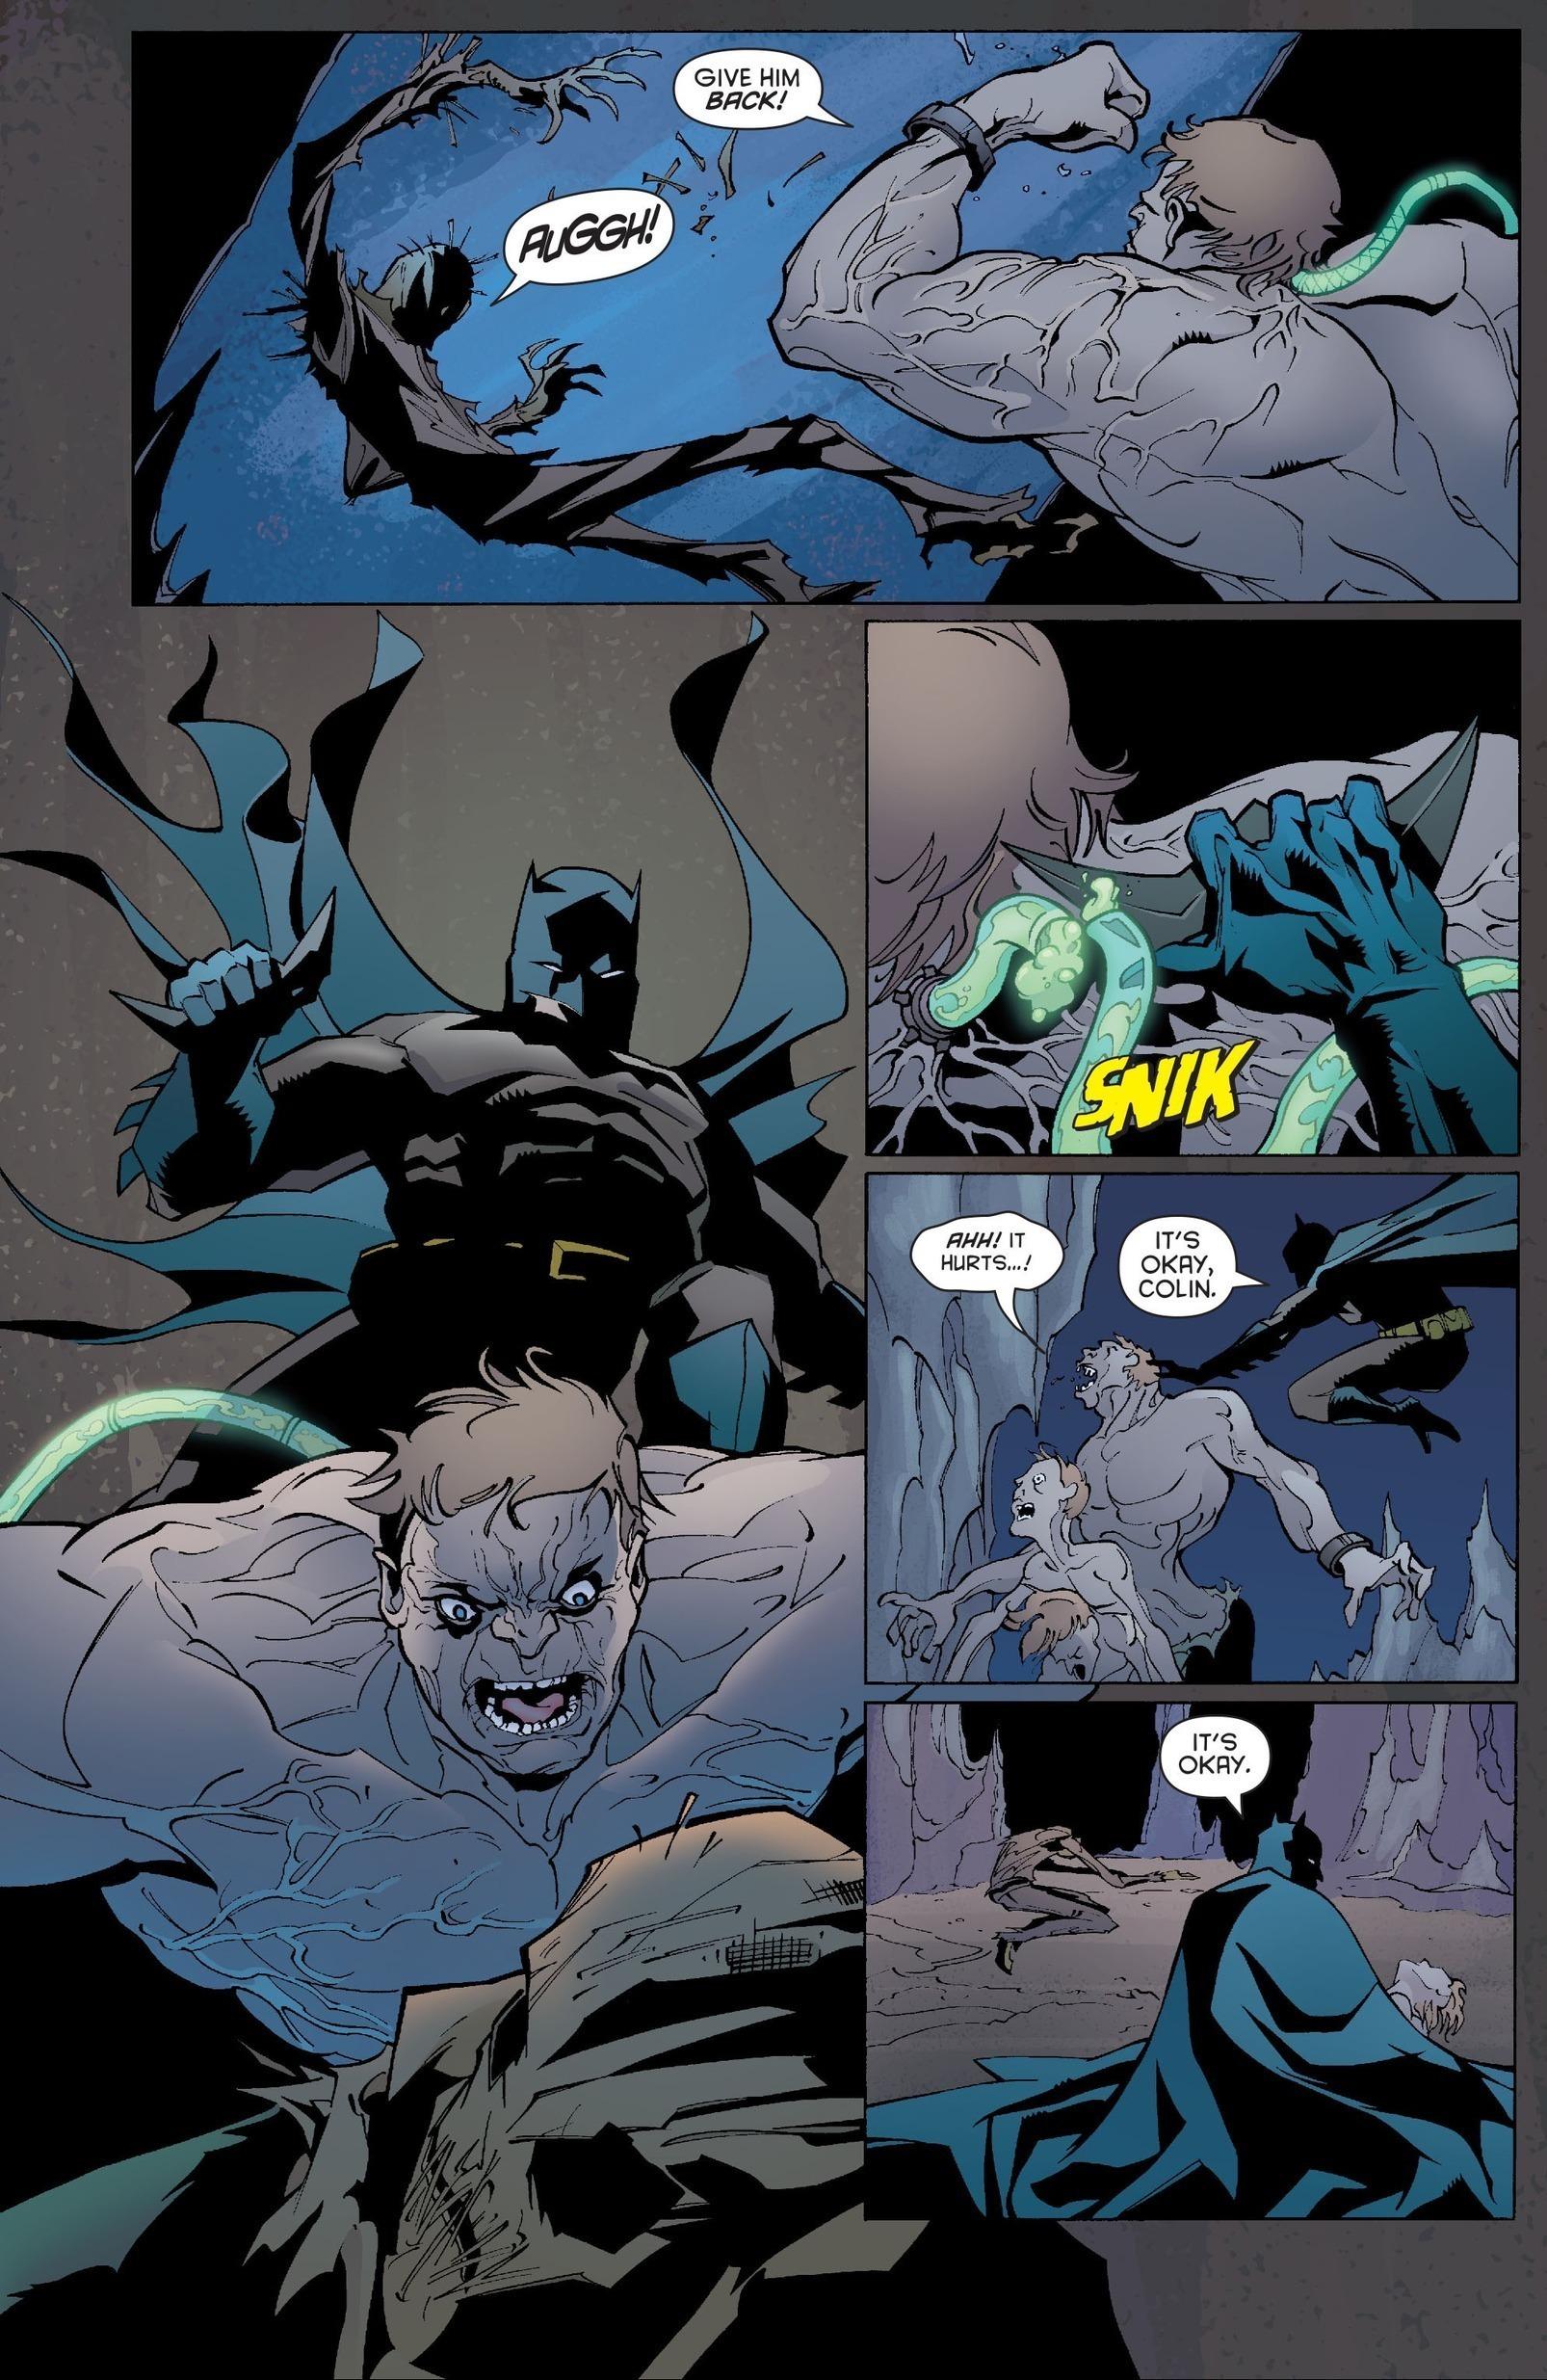 Psychology of Bruce Wayne 2222222222222